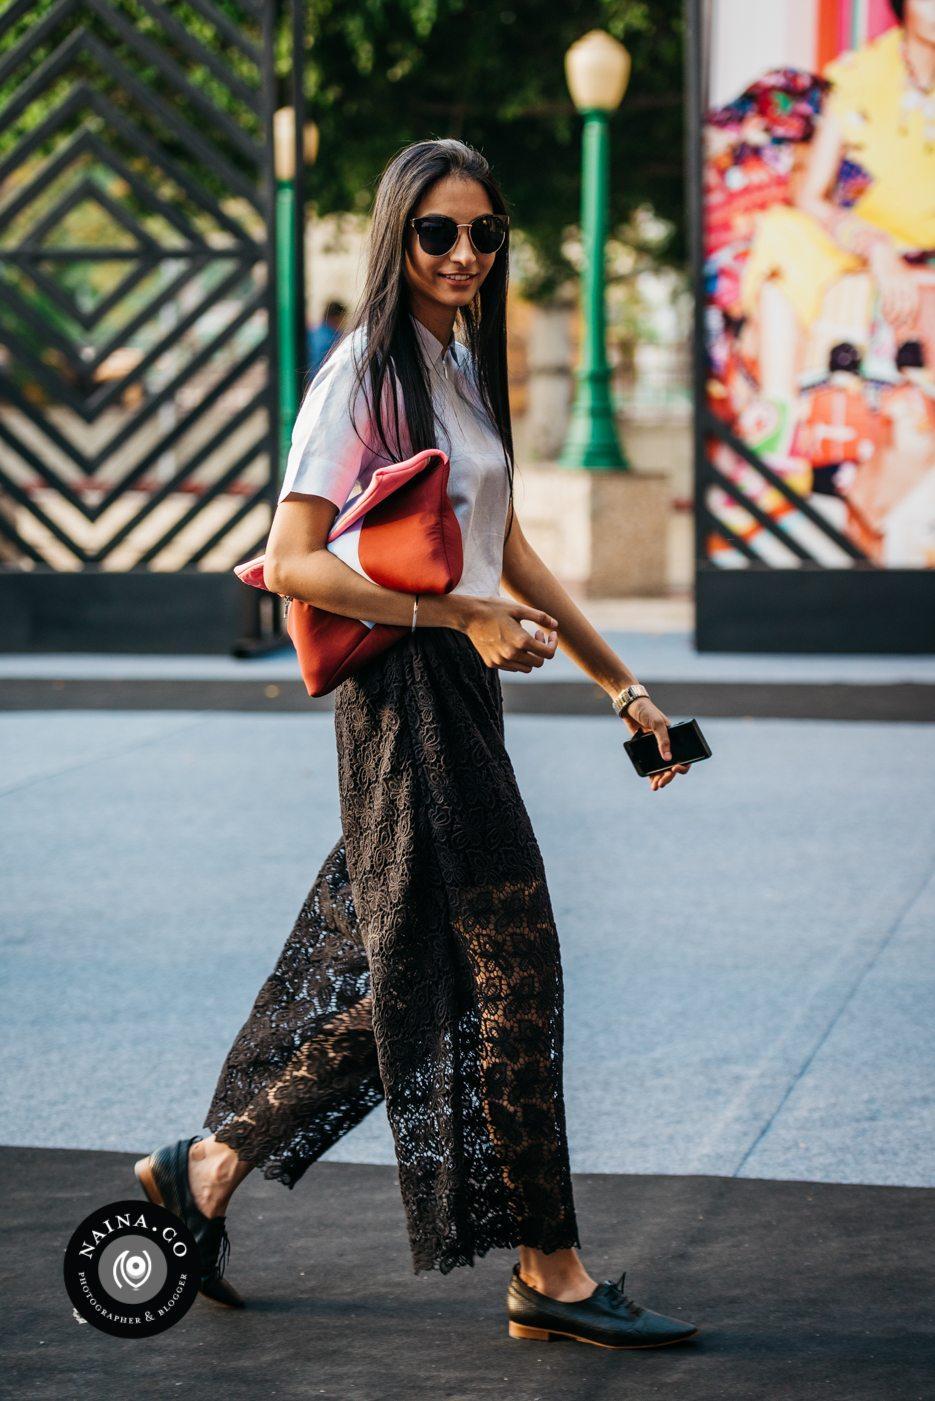 Naina.co-Raconteuse-Visuelle-Photographer-Blogger-Storyteller-Luxury-Lifestyle-March-2015-AIFWAW15-01